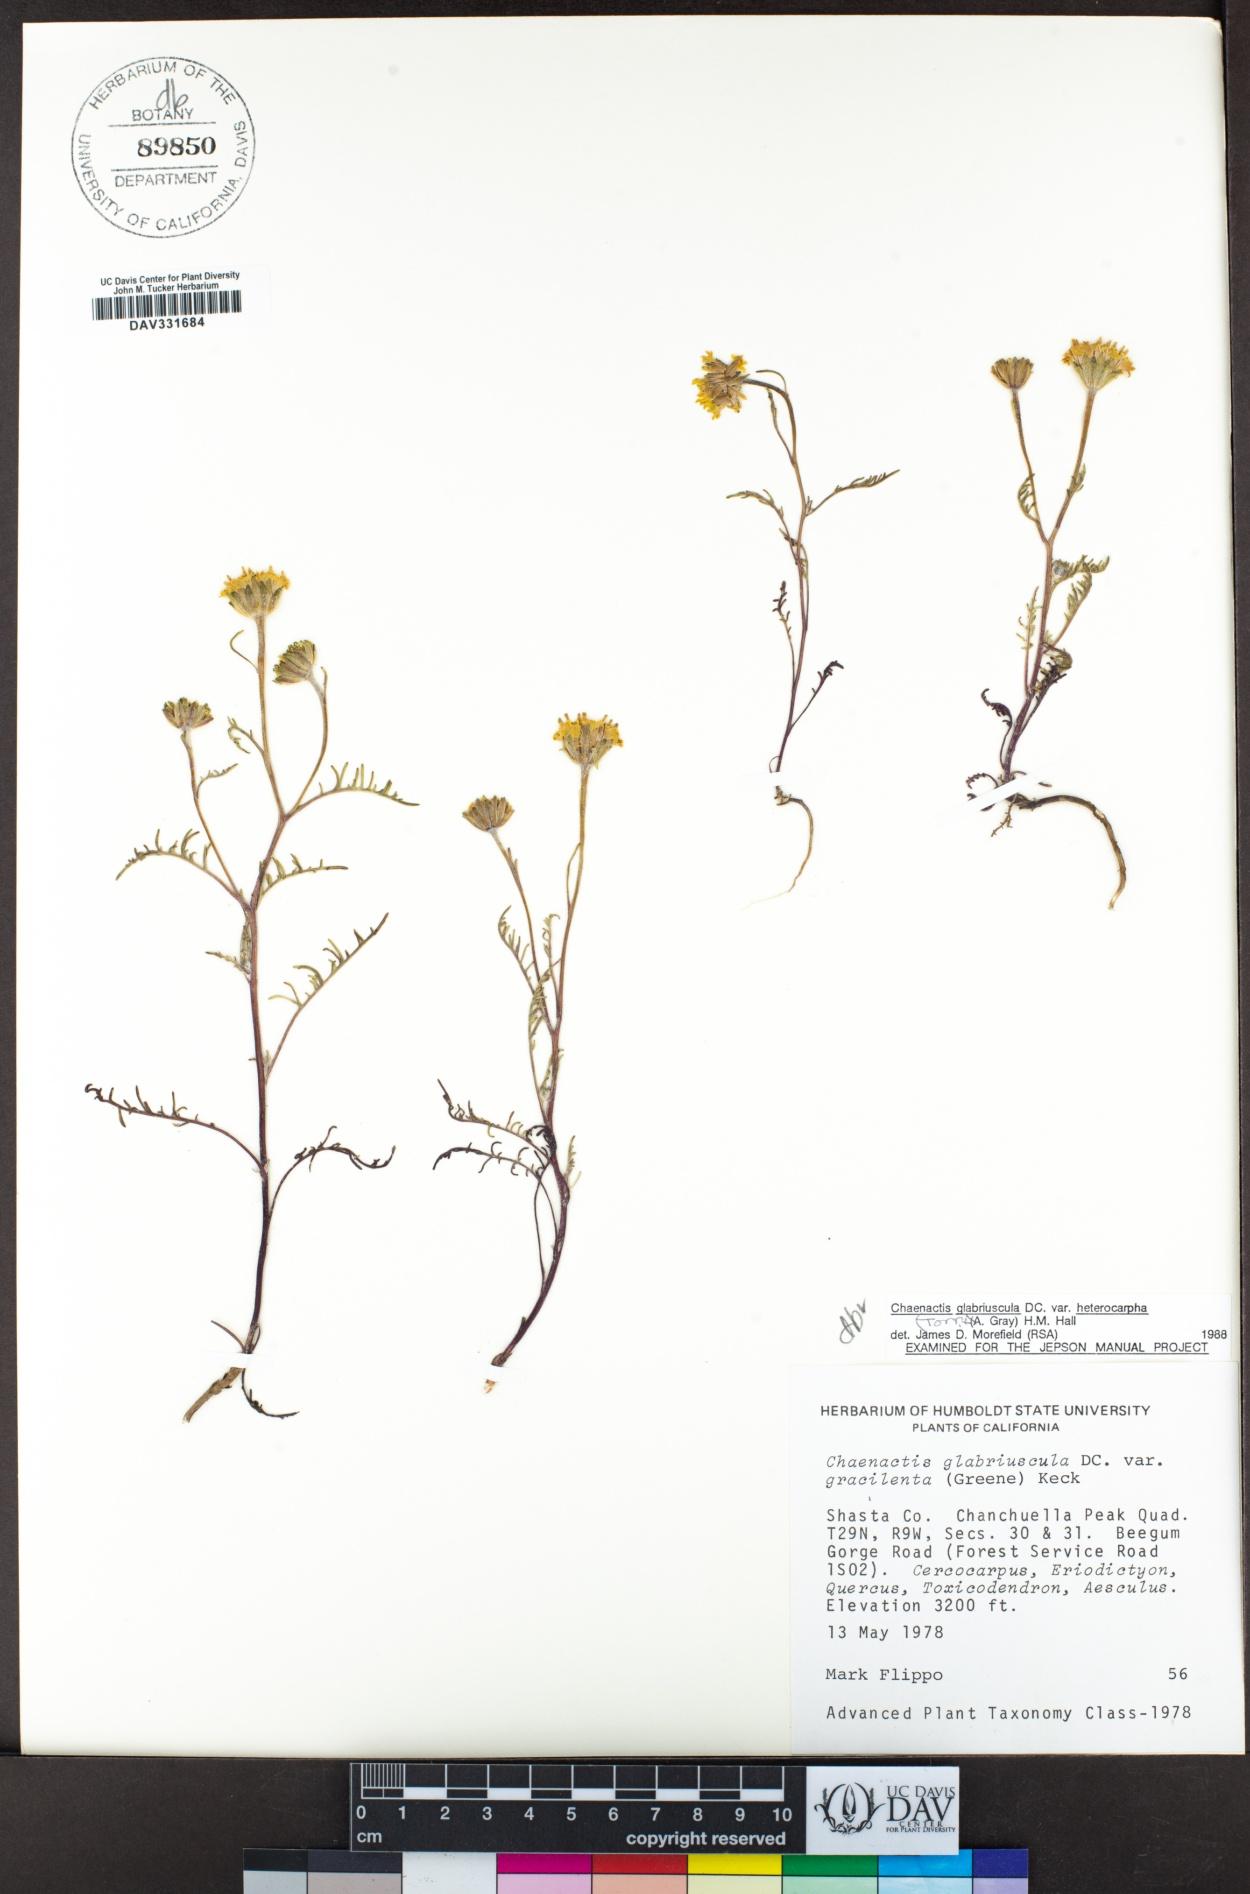 Chaenactis image